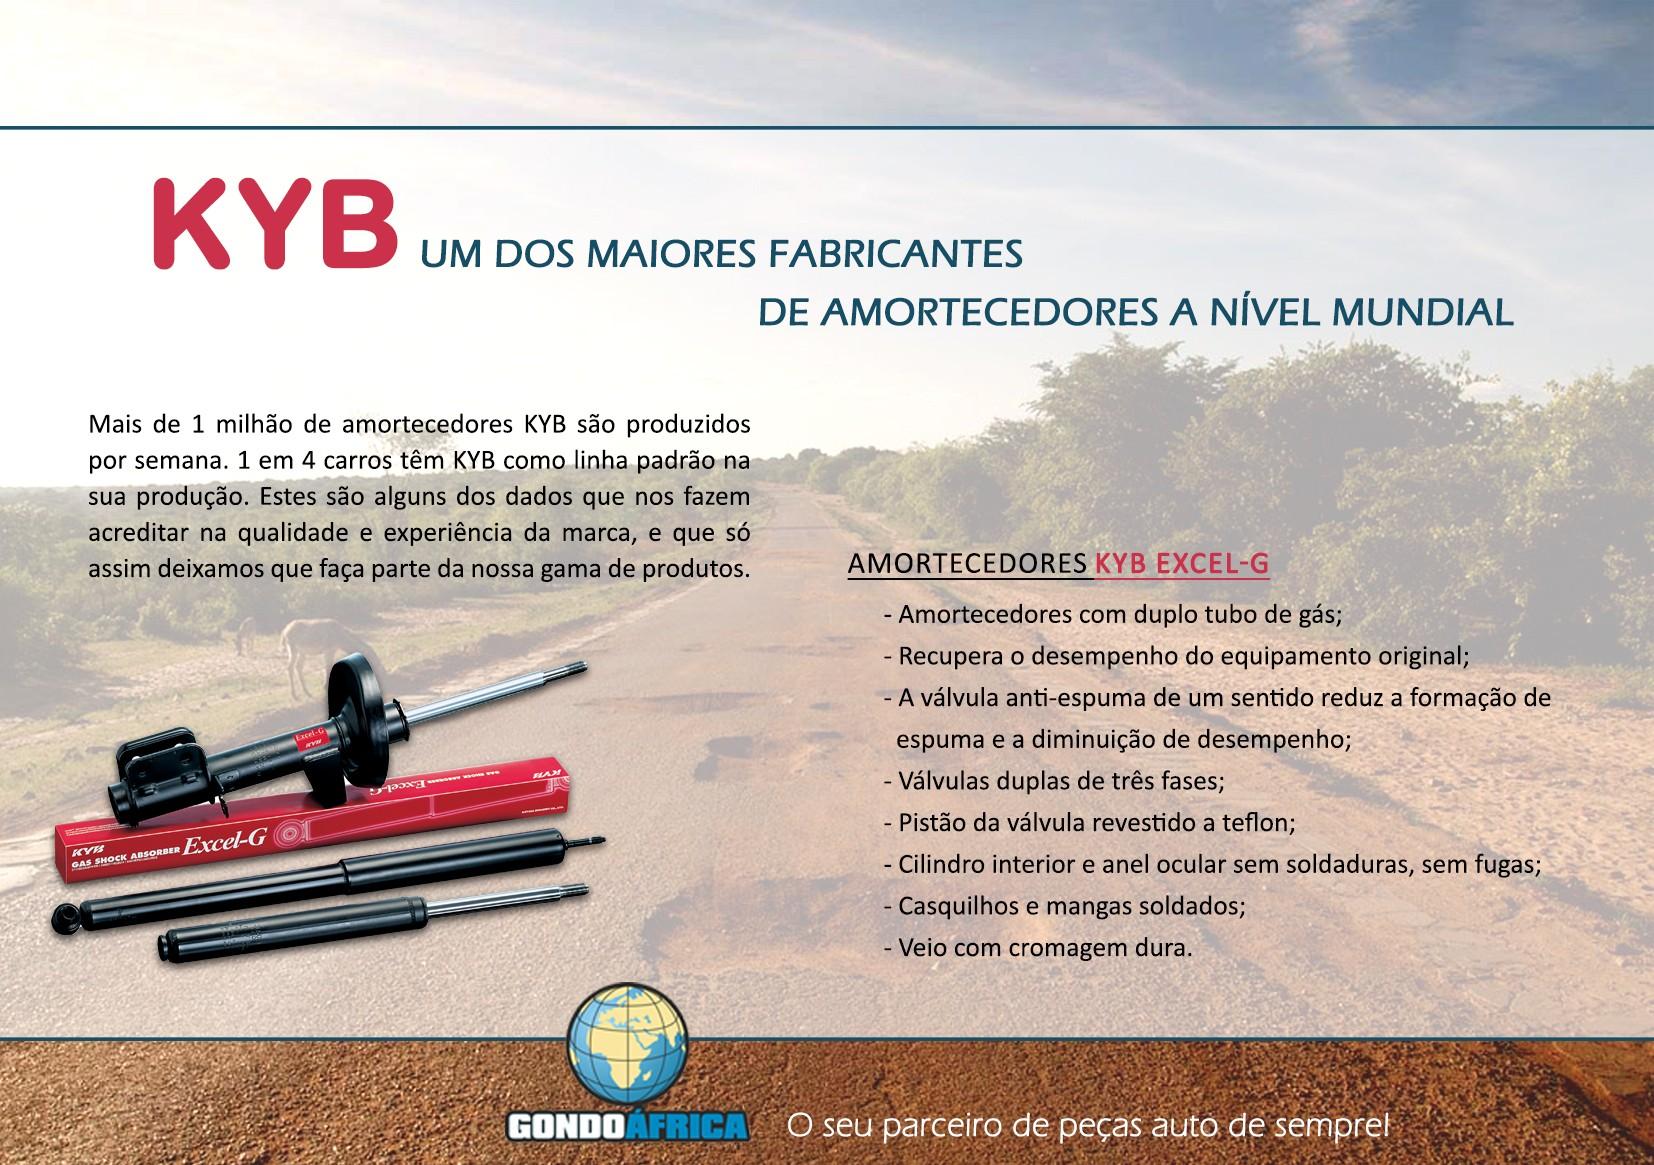 Newsletter KYB Proposta I